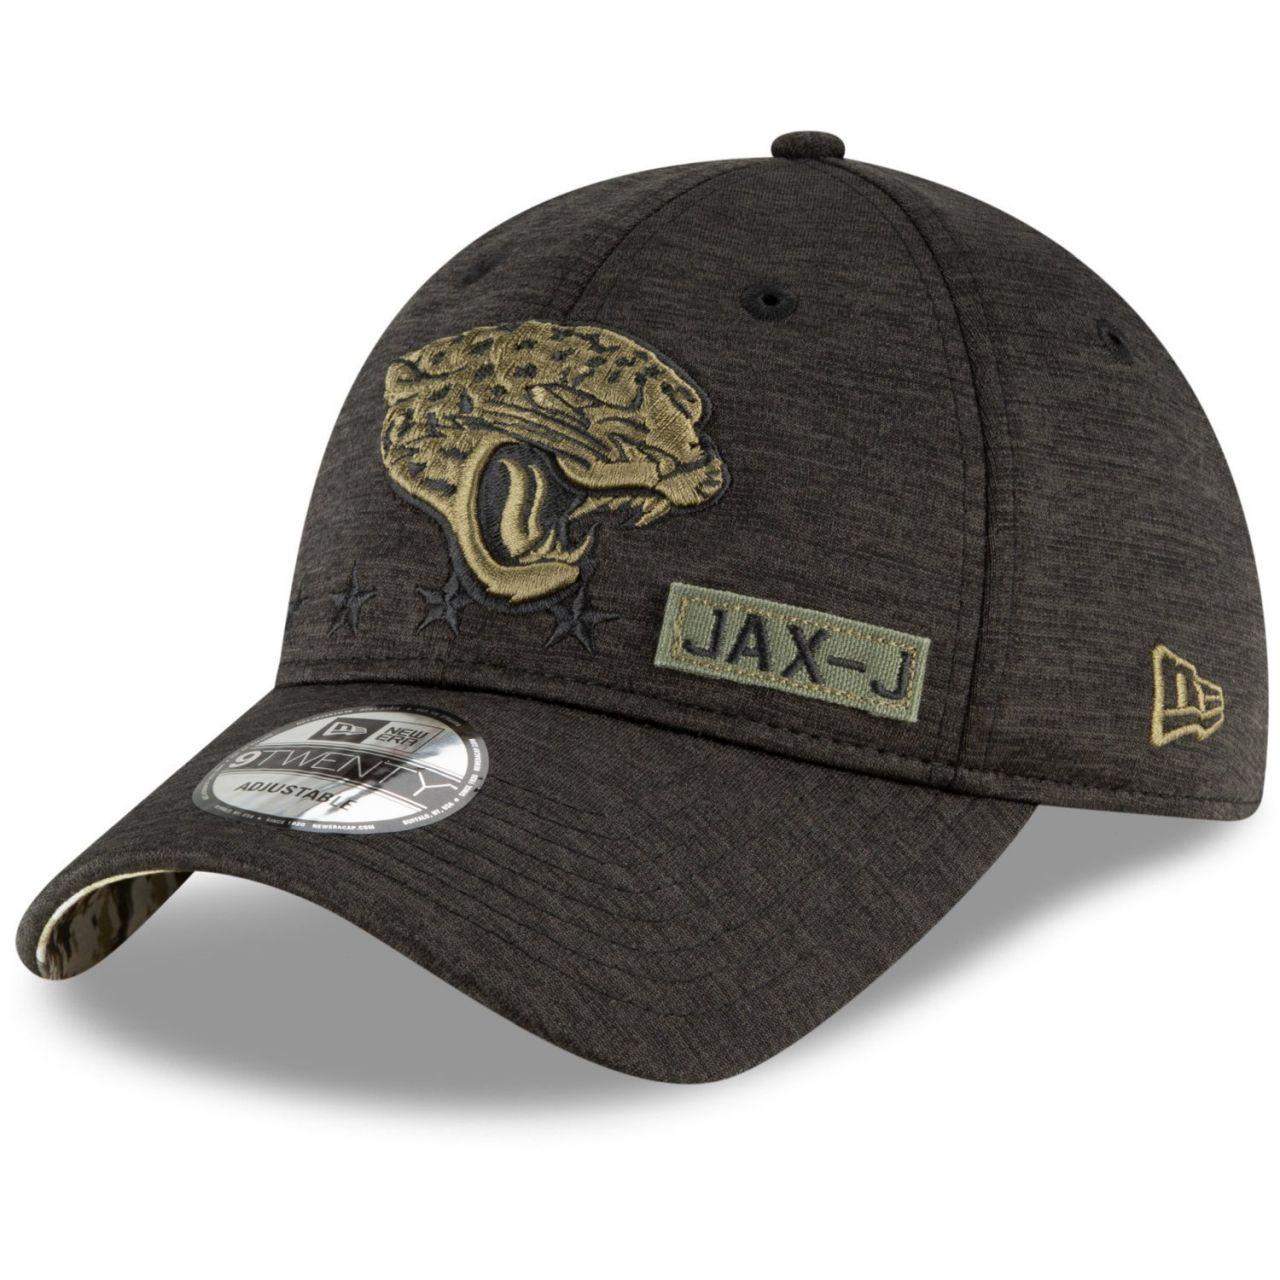 amfoo - New Era 9TWENTY Cap Salute to Service Jacksonville Jaguars